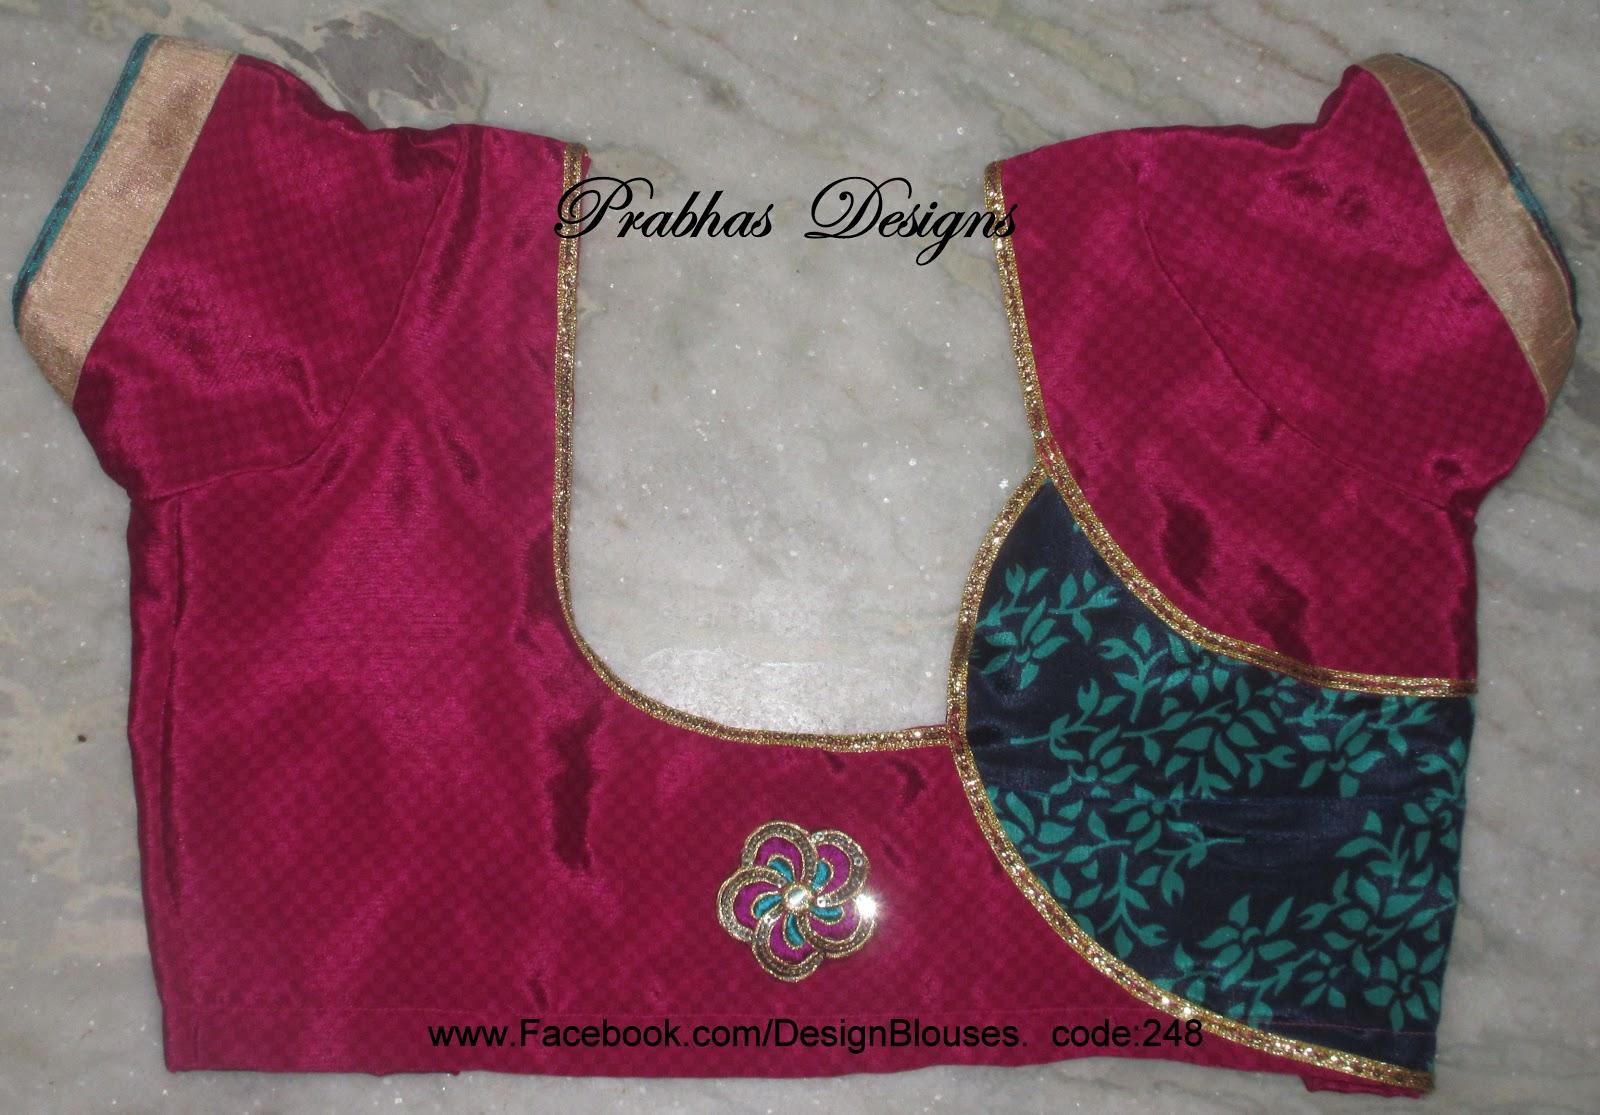 Prabhas Designs: Aari Embroidery Classes By PrabhasDesigns: Designer Blouses